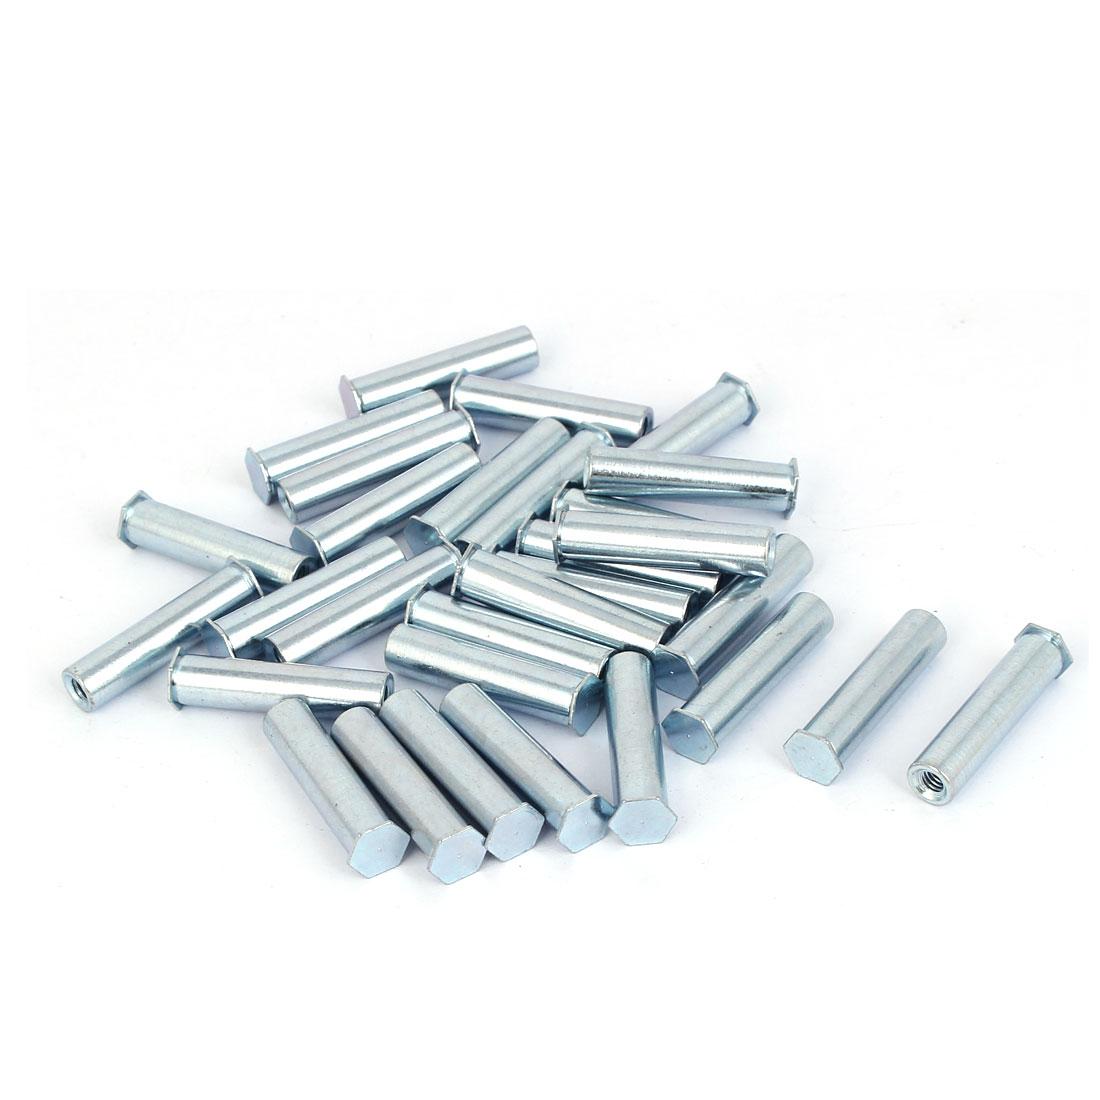 Carbon Steel Zinc Plated Hex Head Full Thread Self Clinching Standoff Silver Tone M4x30mm 30pcs